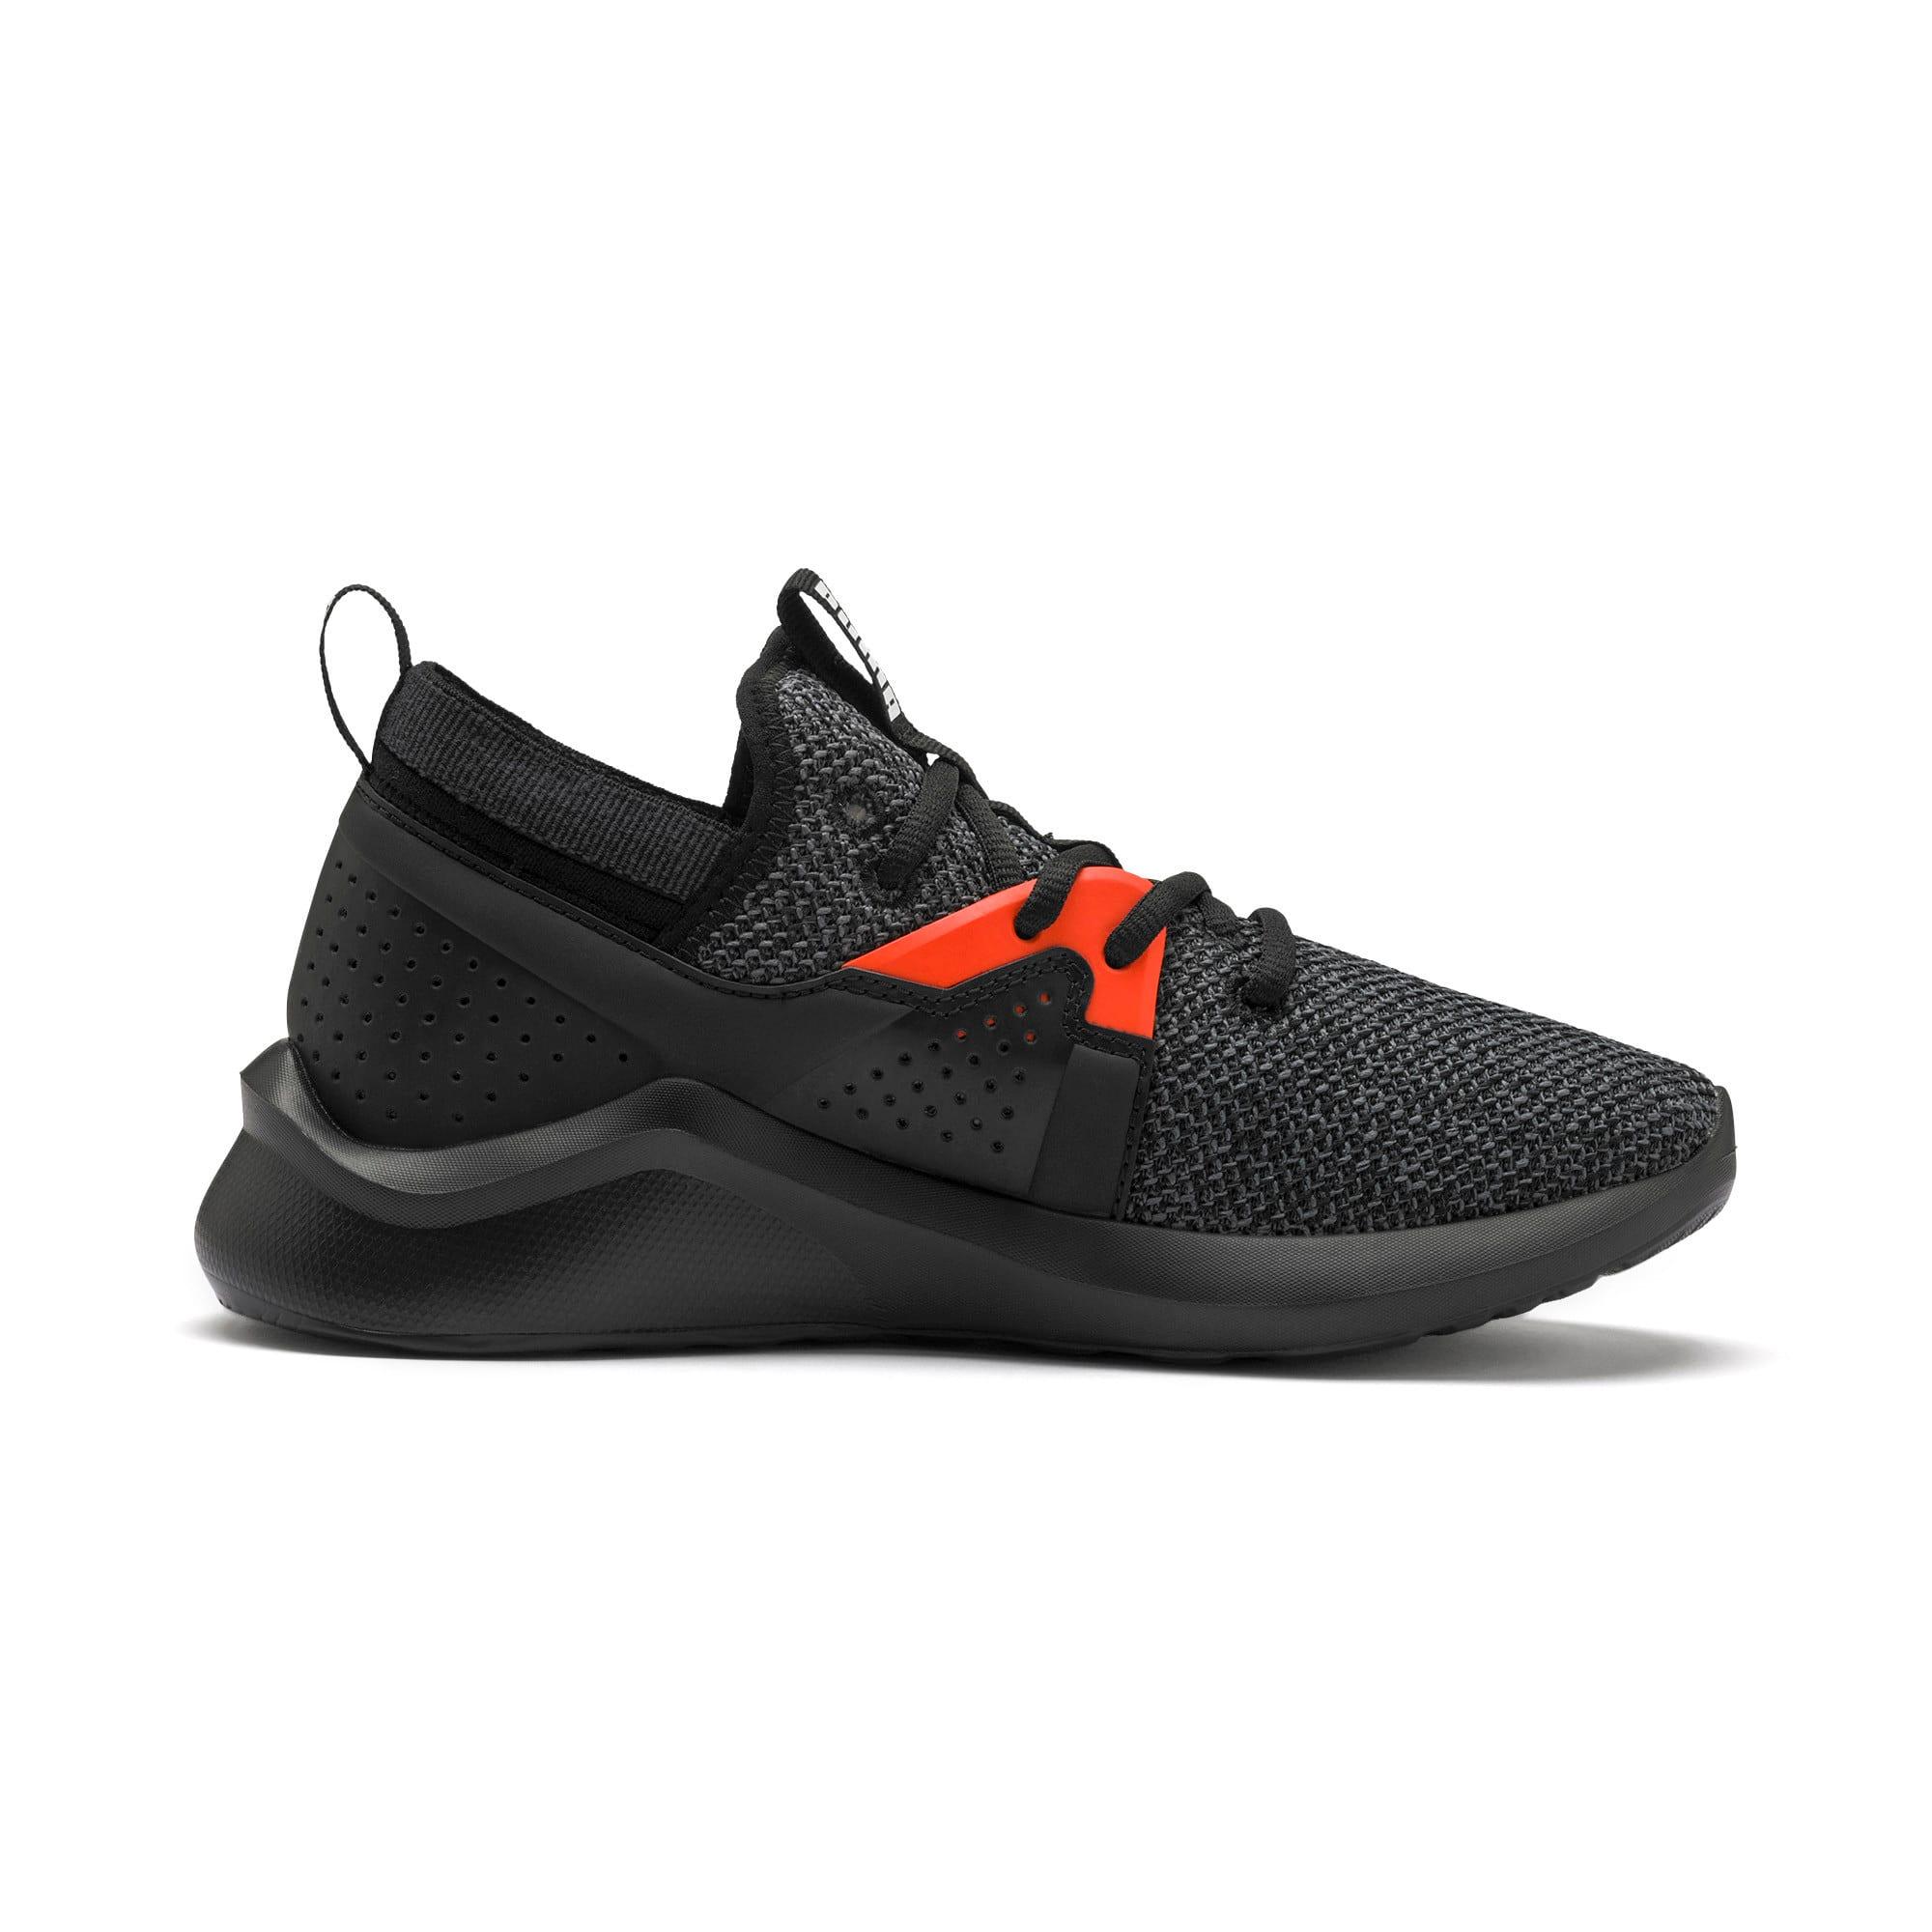 Thumbnail 5 of Emergence Sneakers JR, Puma Black-Cherry Tomato, medium